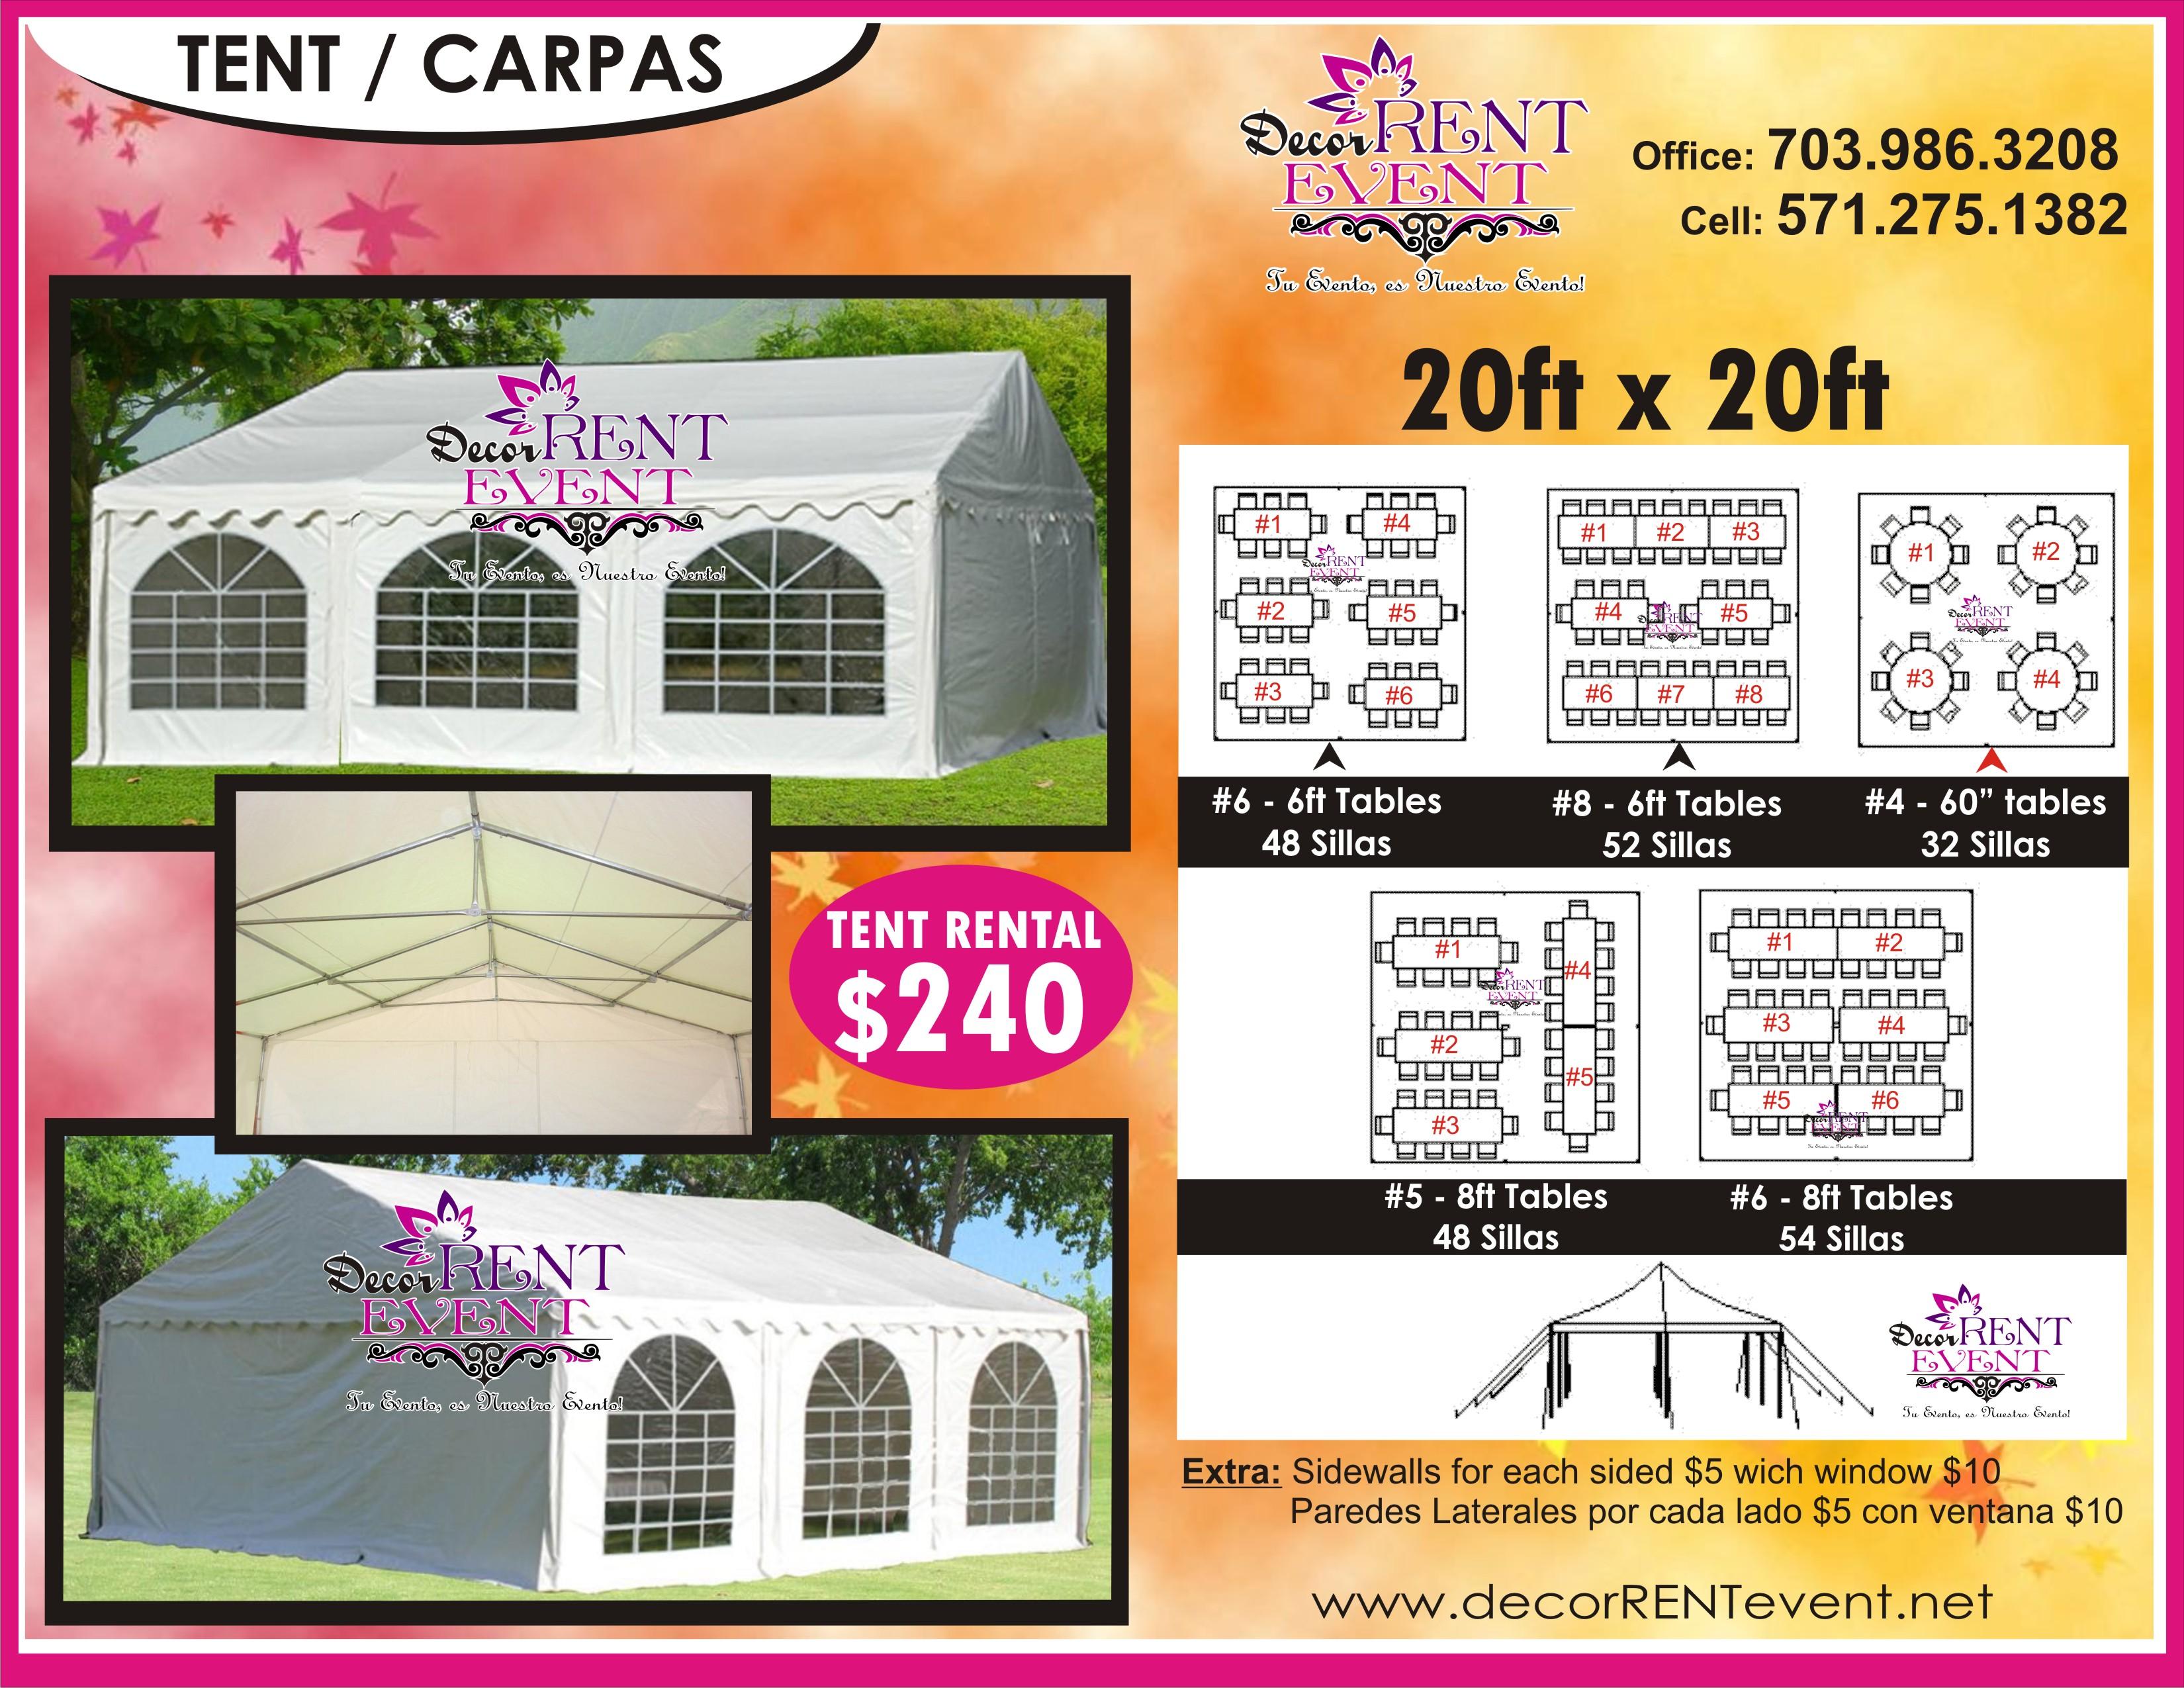 CARPAS 20x20